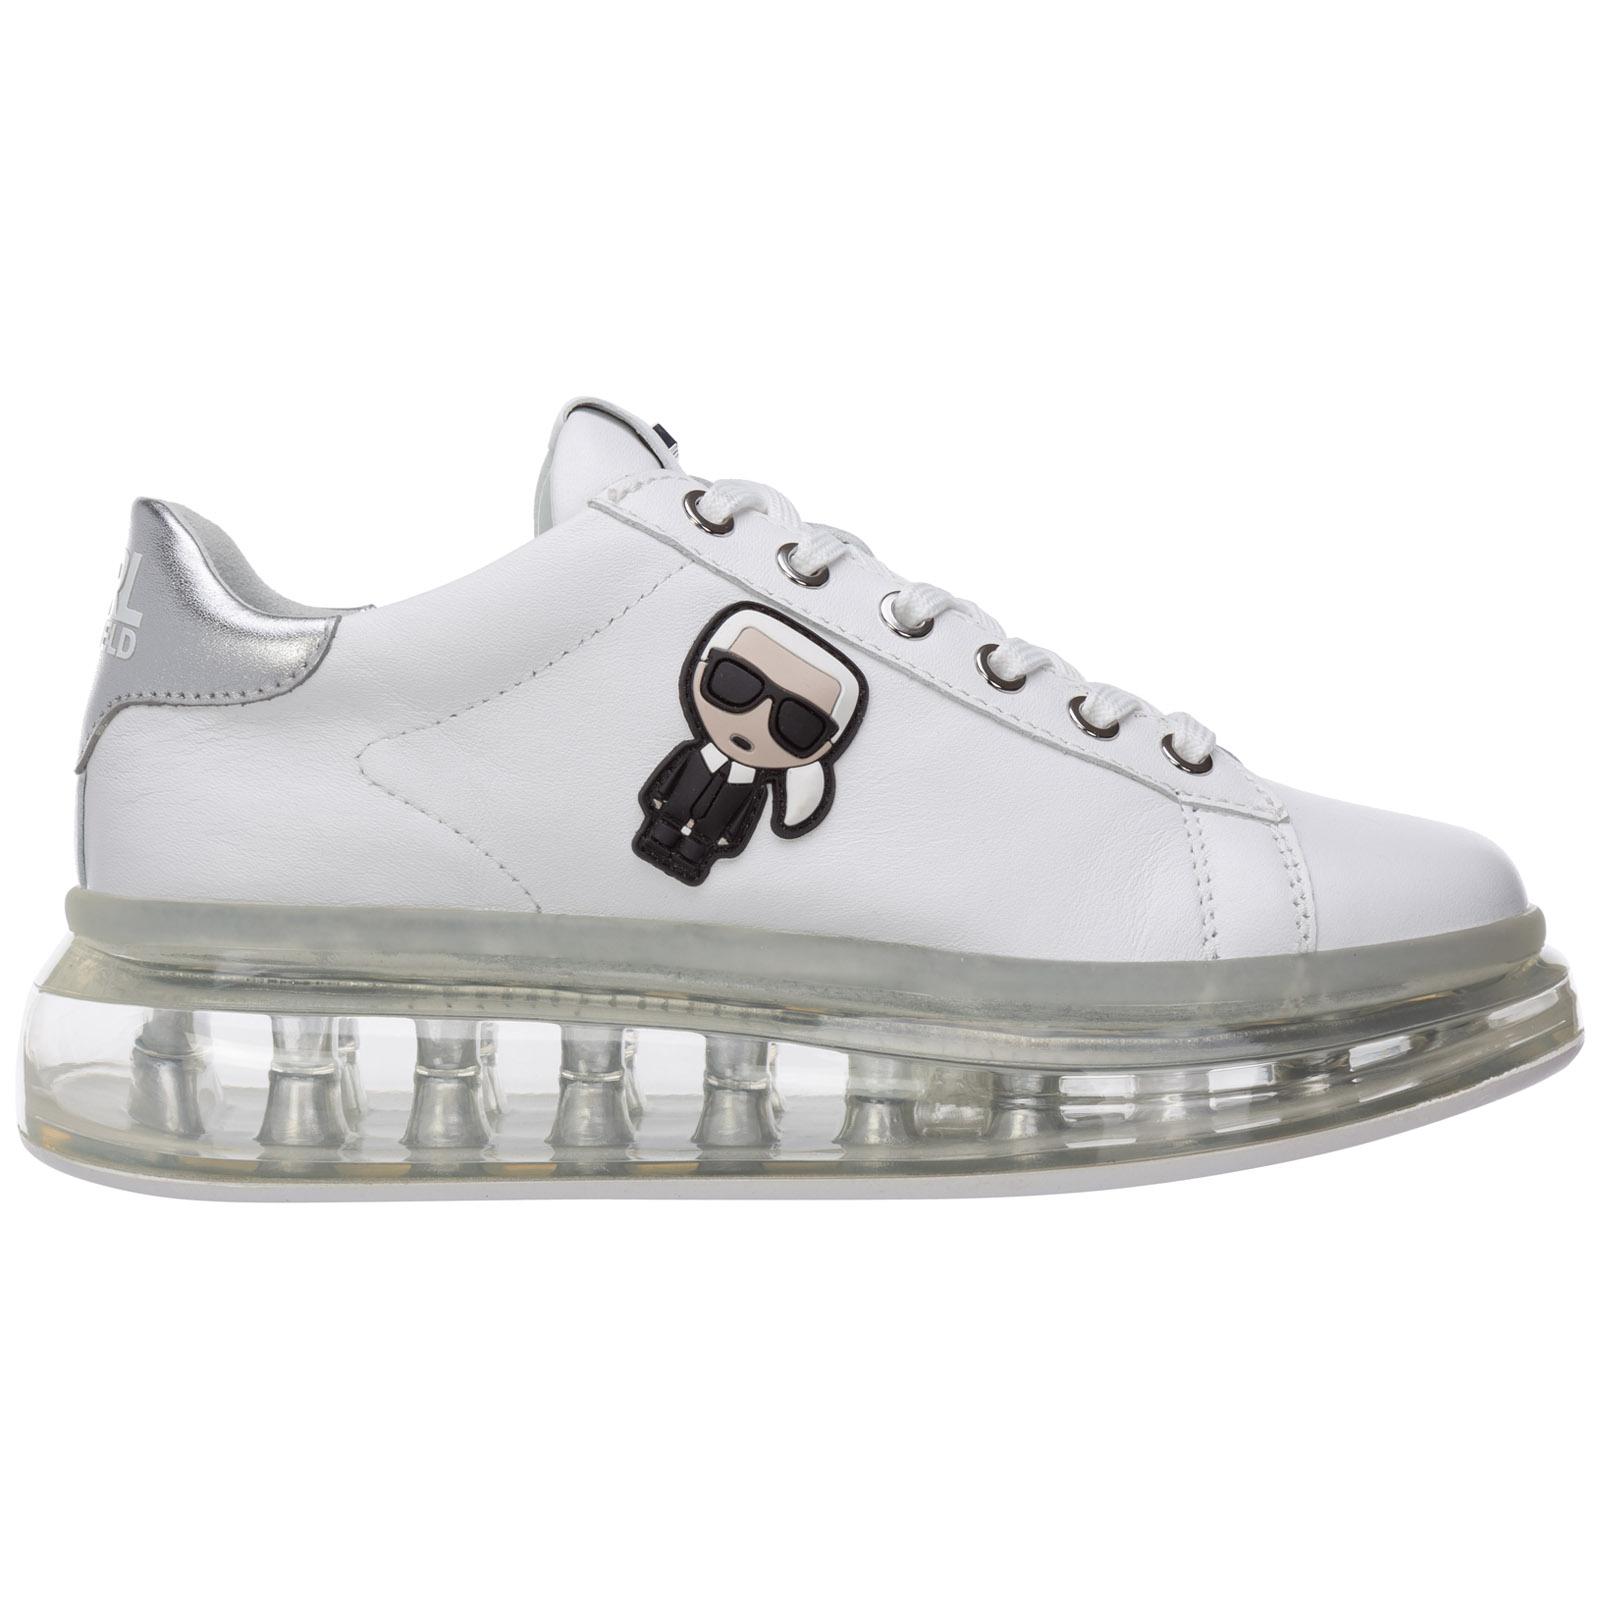 Sneakers Karl Lagerfeld kapri kushion